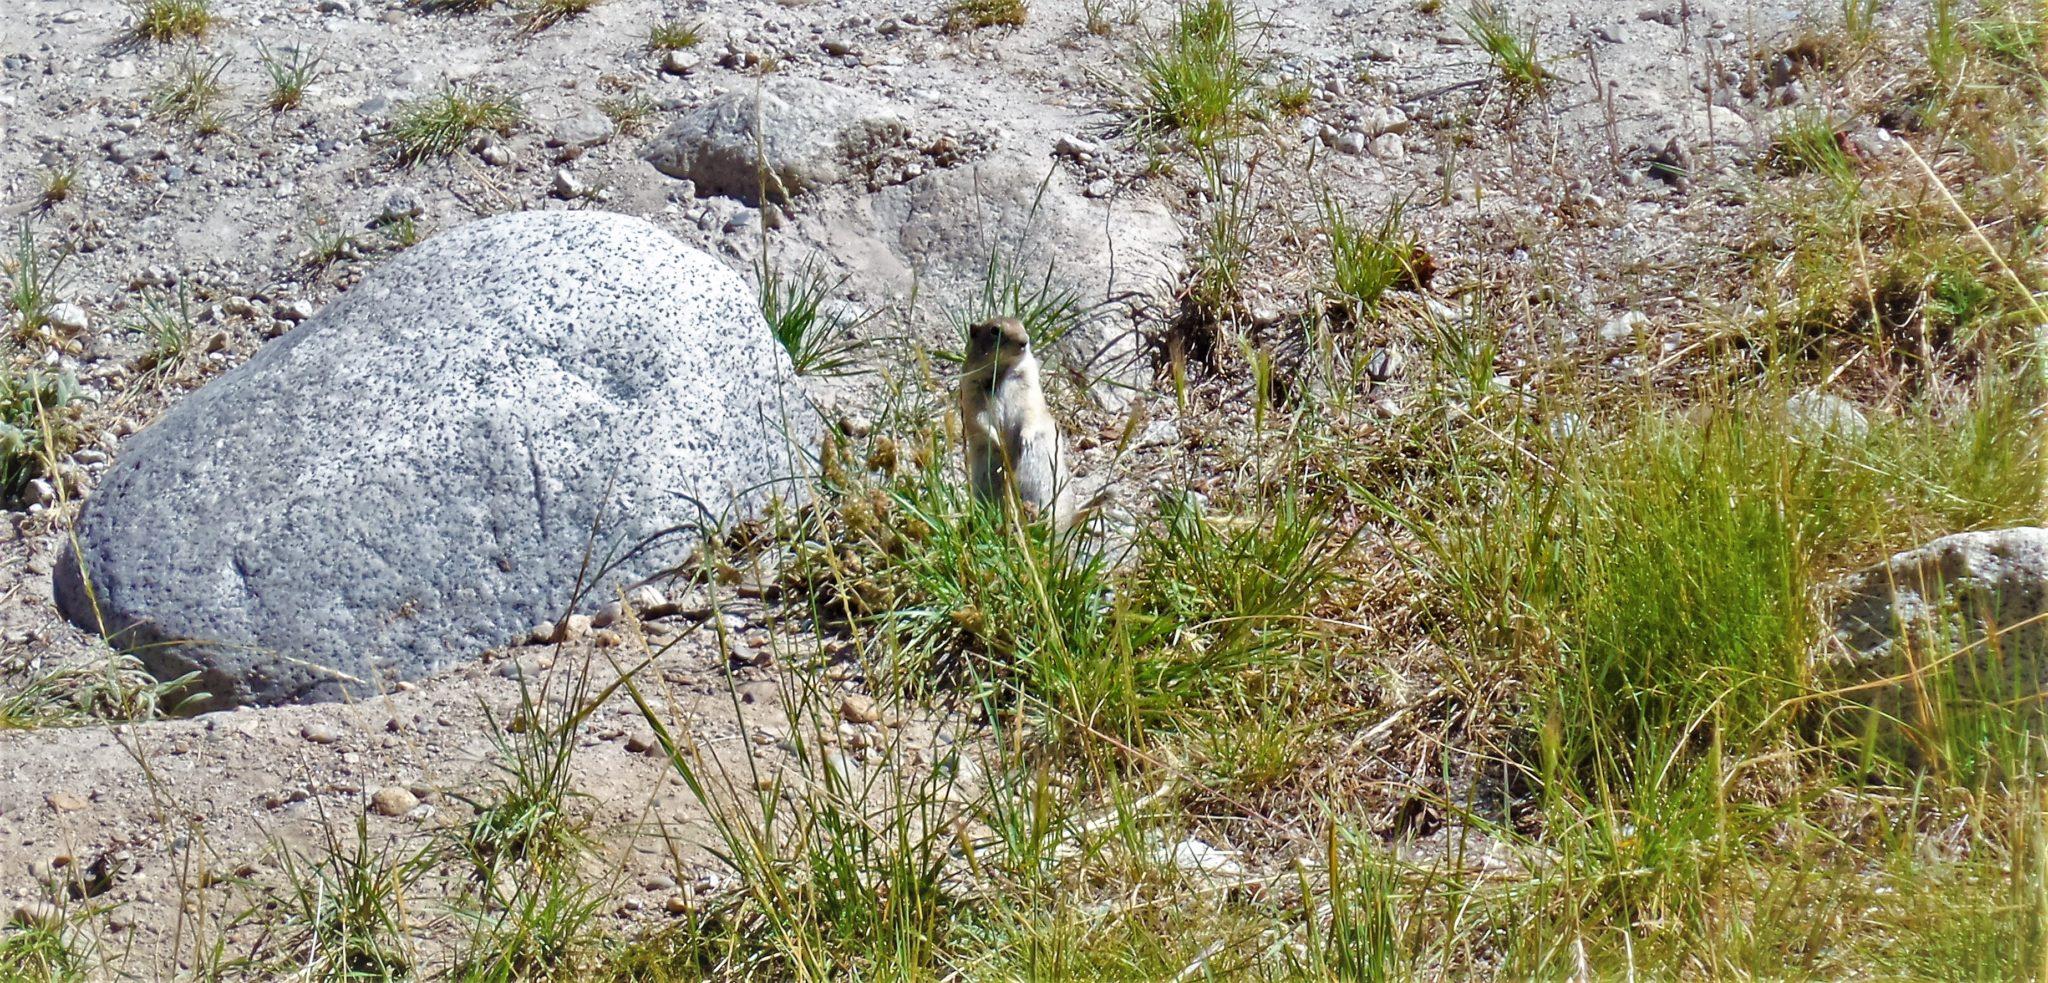 Standing Chipmunk, Yosemite National Park, California